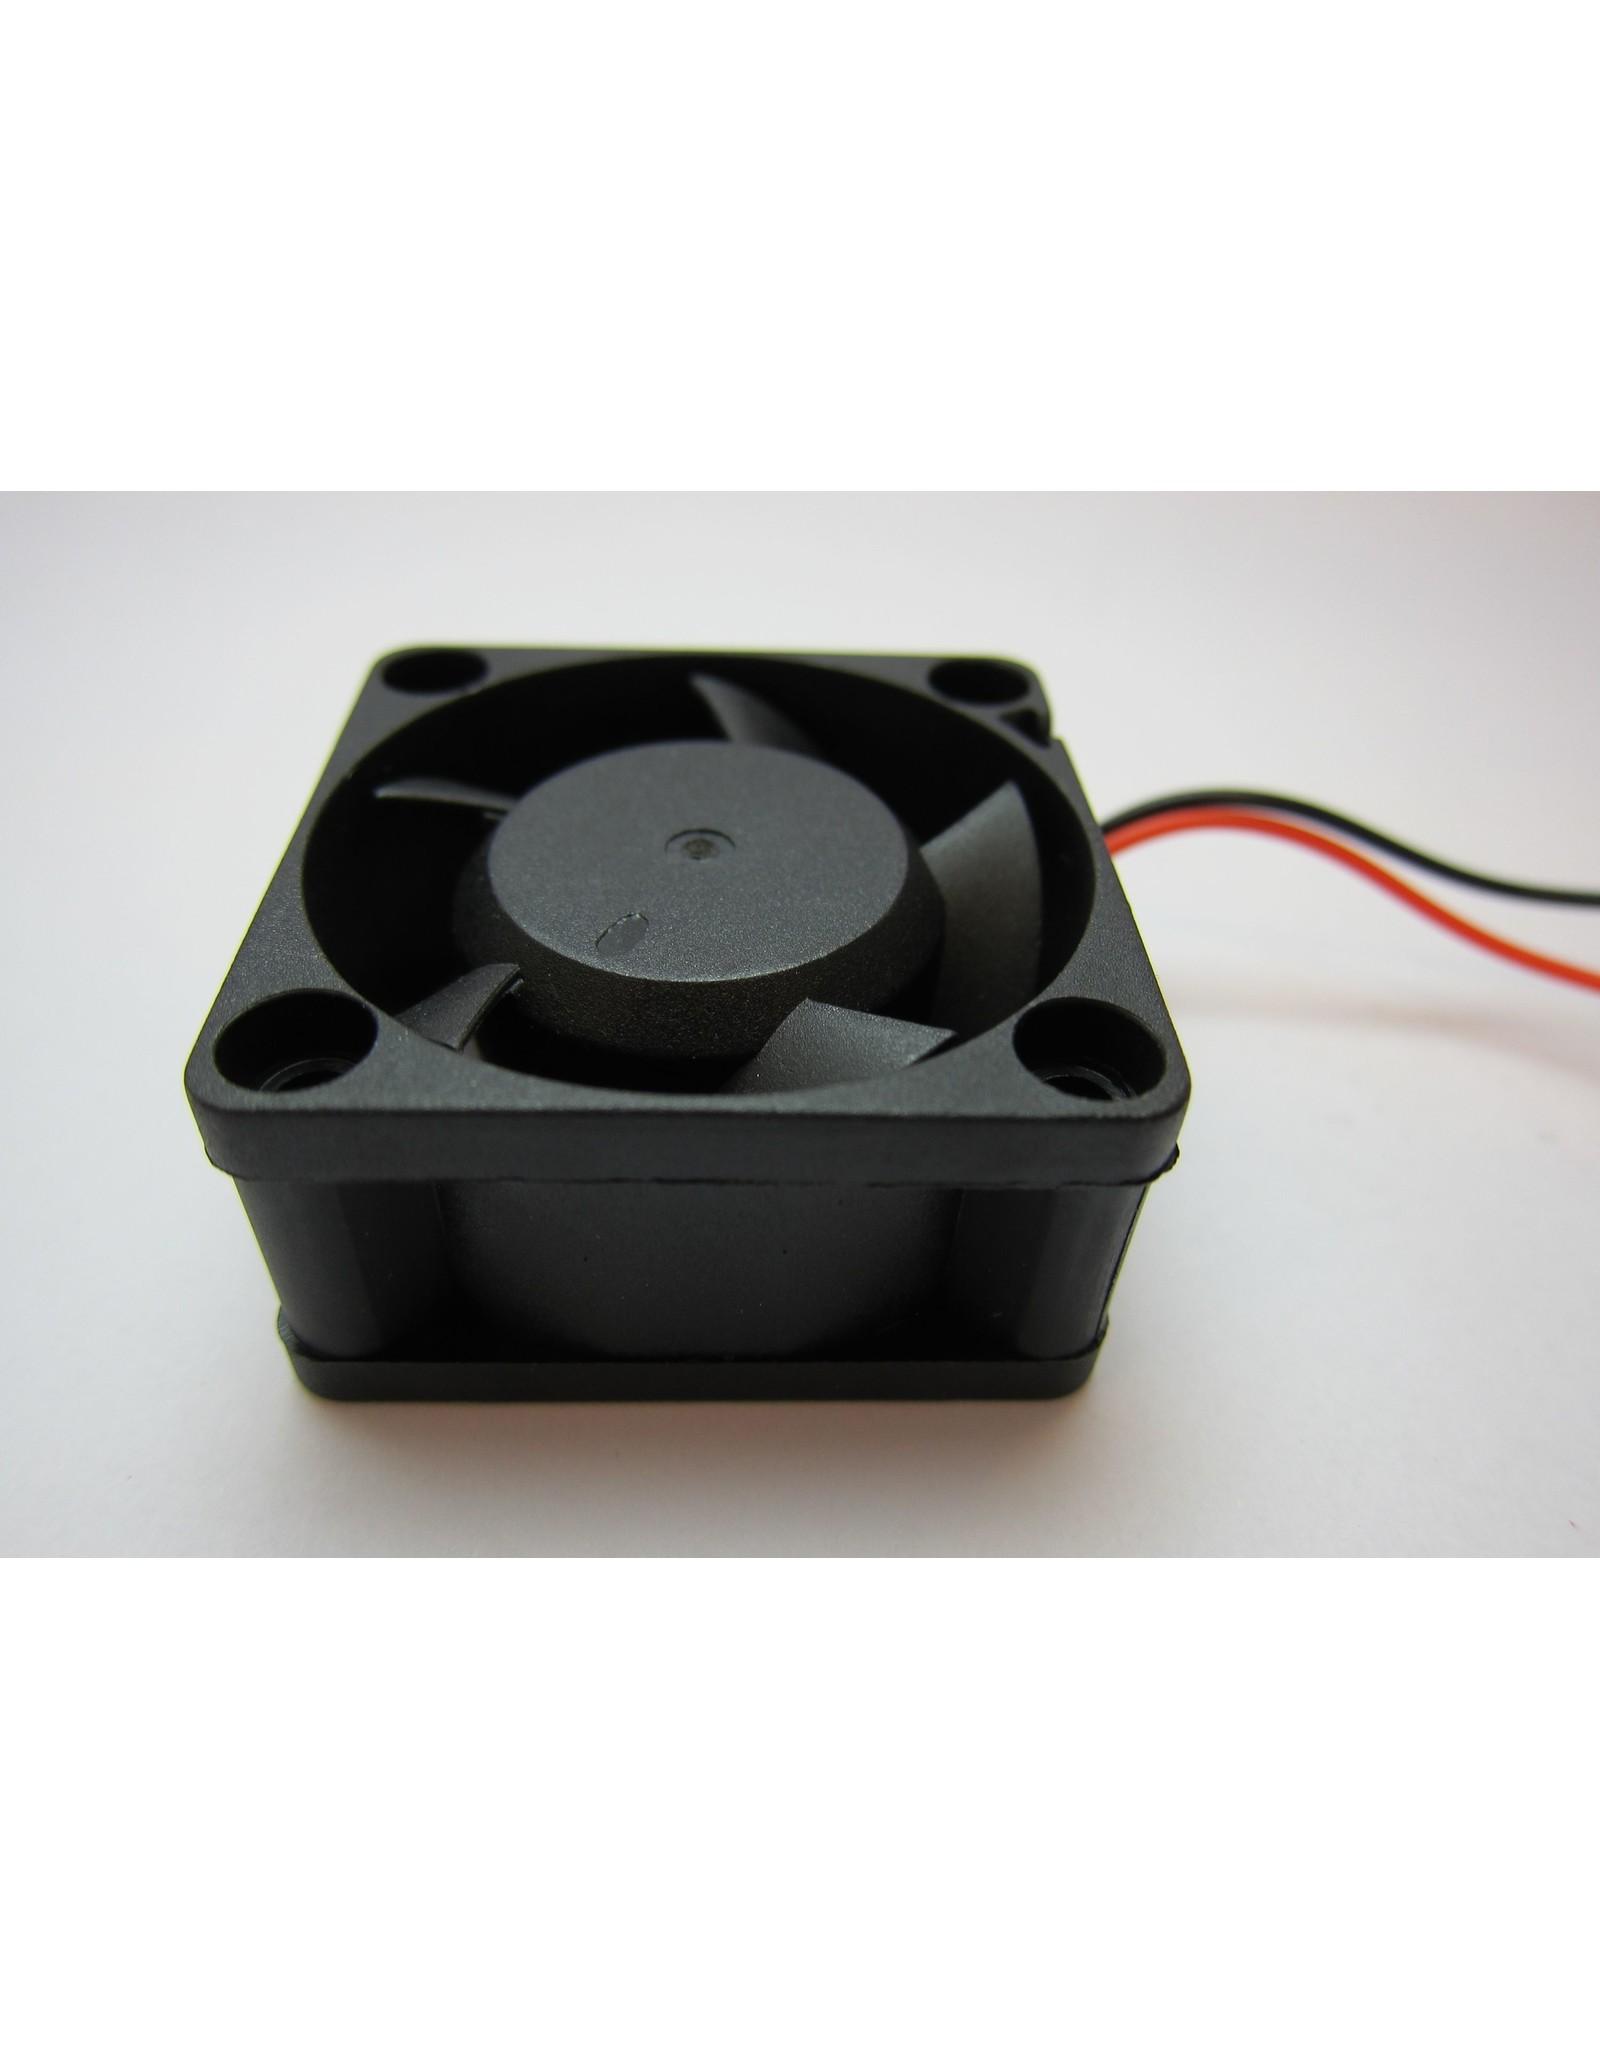 Creality/Ender Creality 3D-schakelkastventilator 40 * 40 * 20